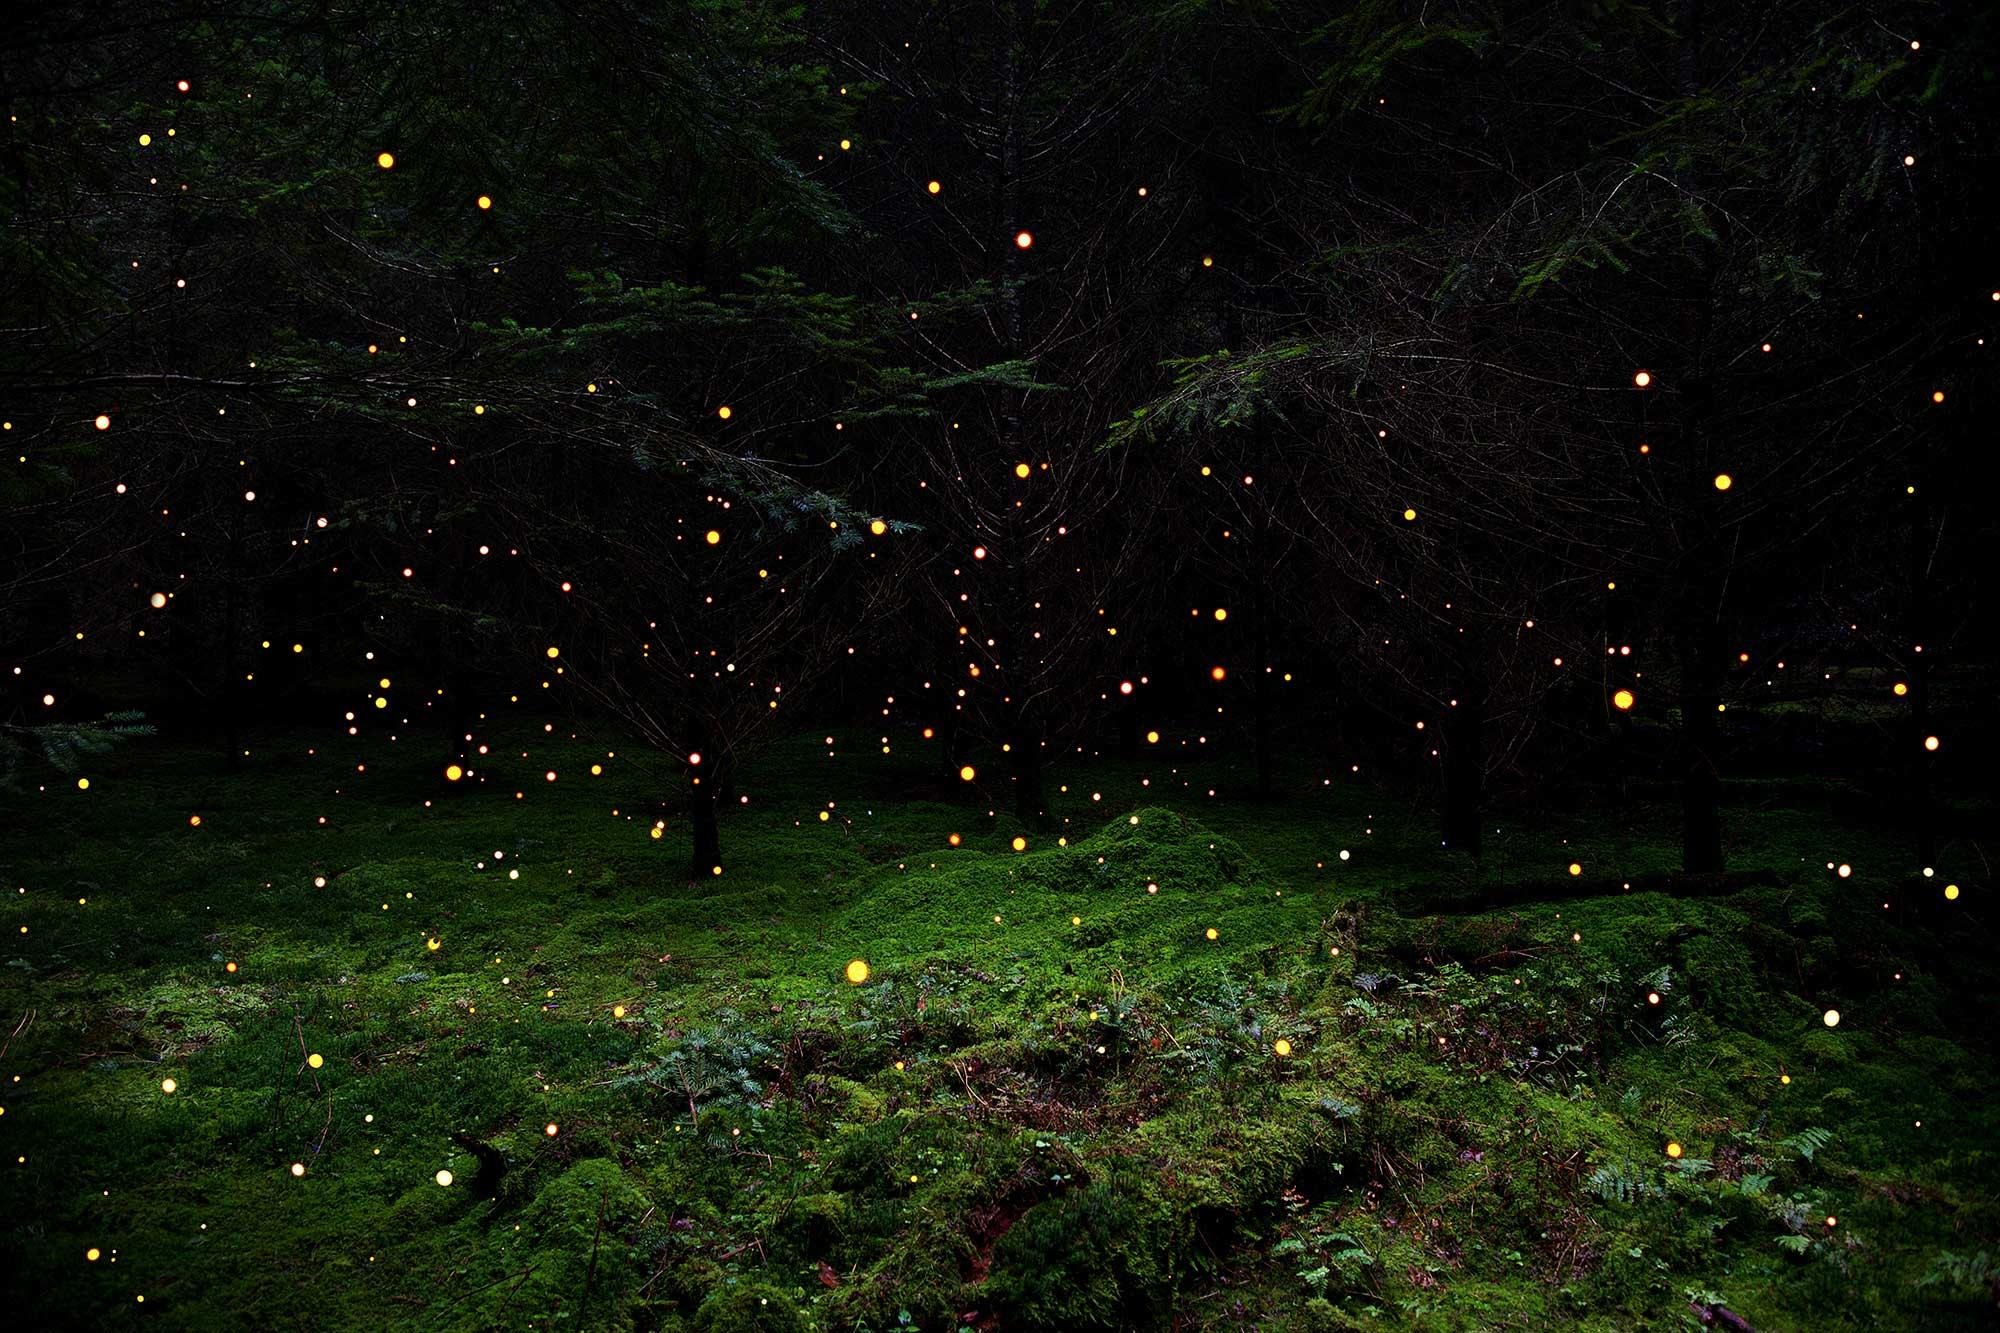 Stars-5-2014.jpg